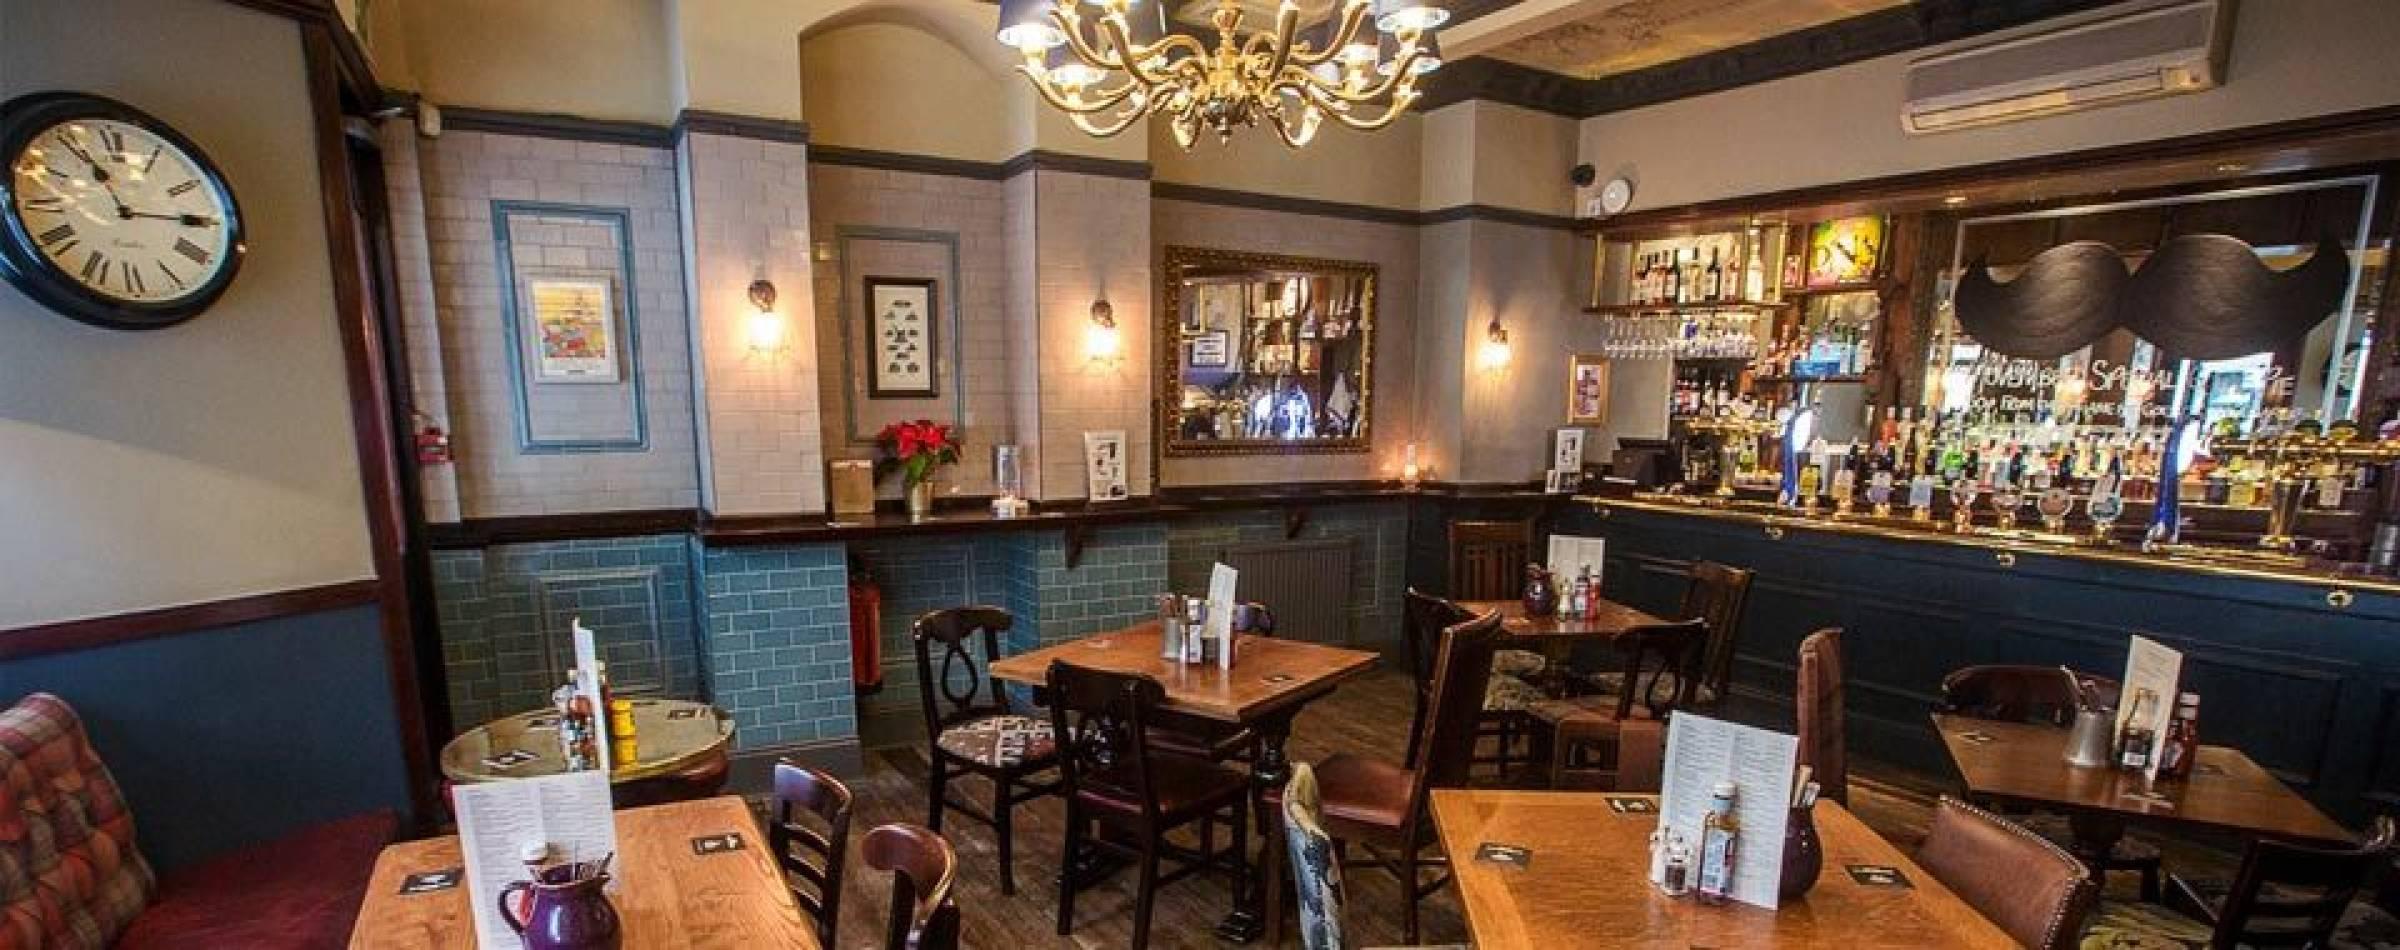 The Windmill, Pub & Restaurant Mayfair London UK